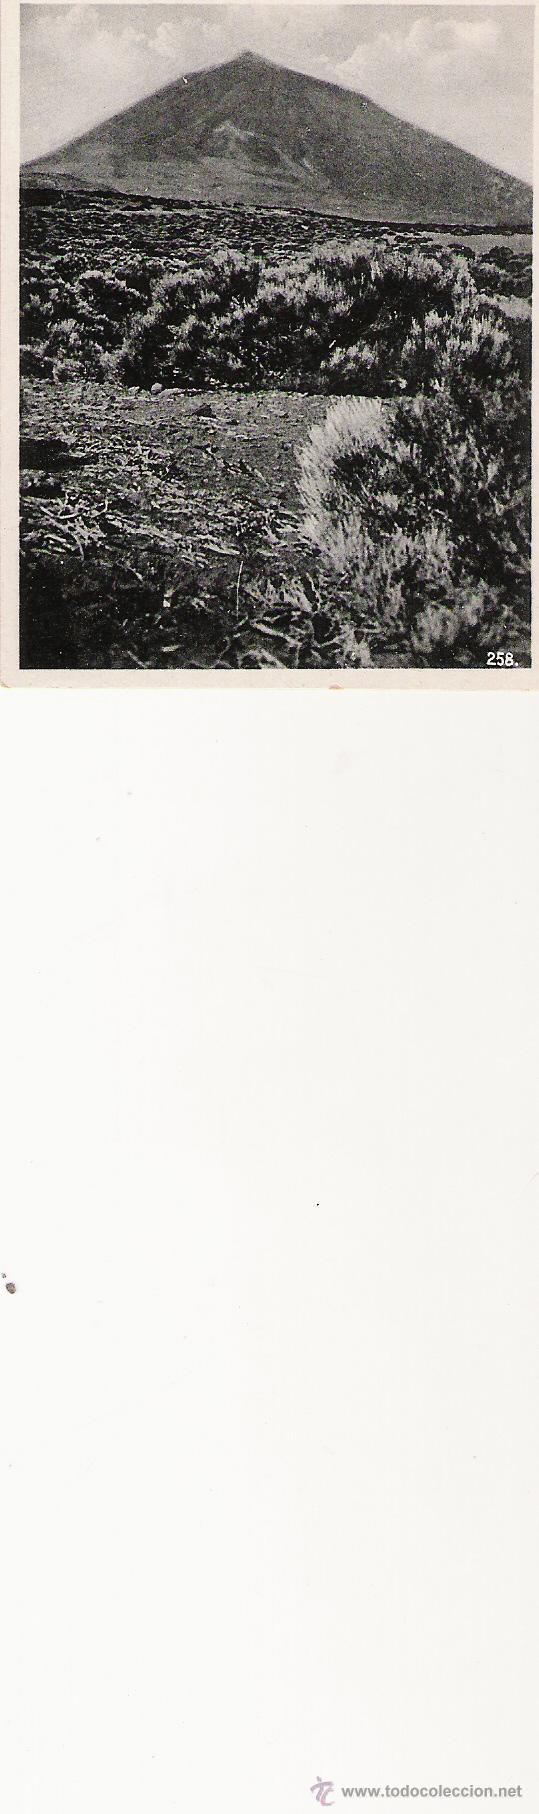 PIK - 258 - FOTO-CENTRAL - STA. CRUZ DE TENERIFE - 9.1 X 7 CM. - (Postales - España - Canarias Antigua (hasta 1939))